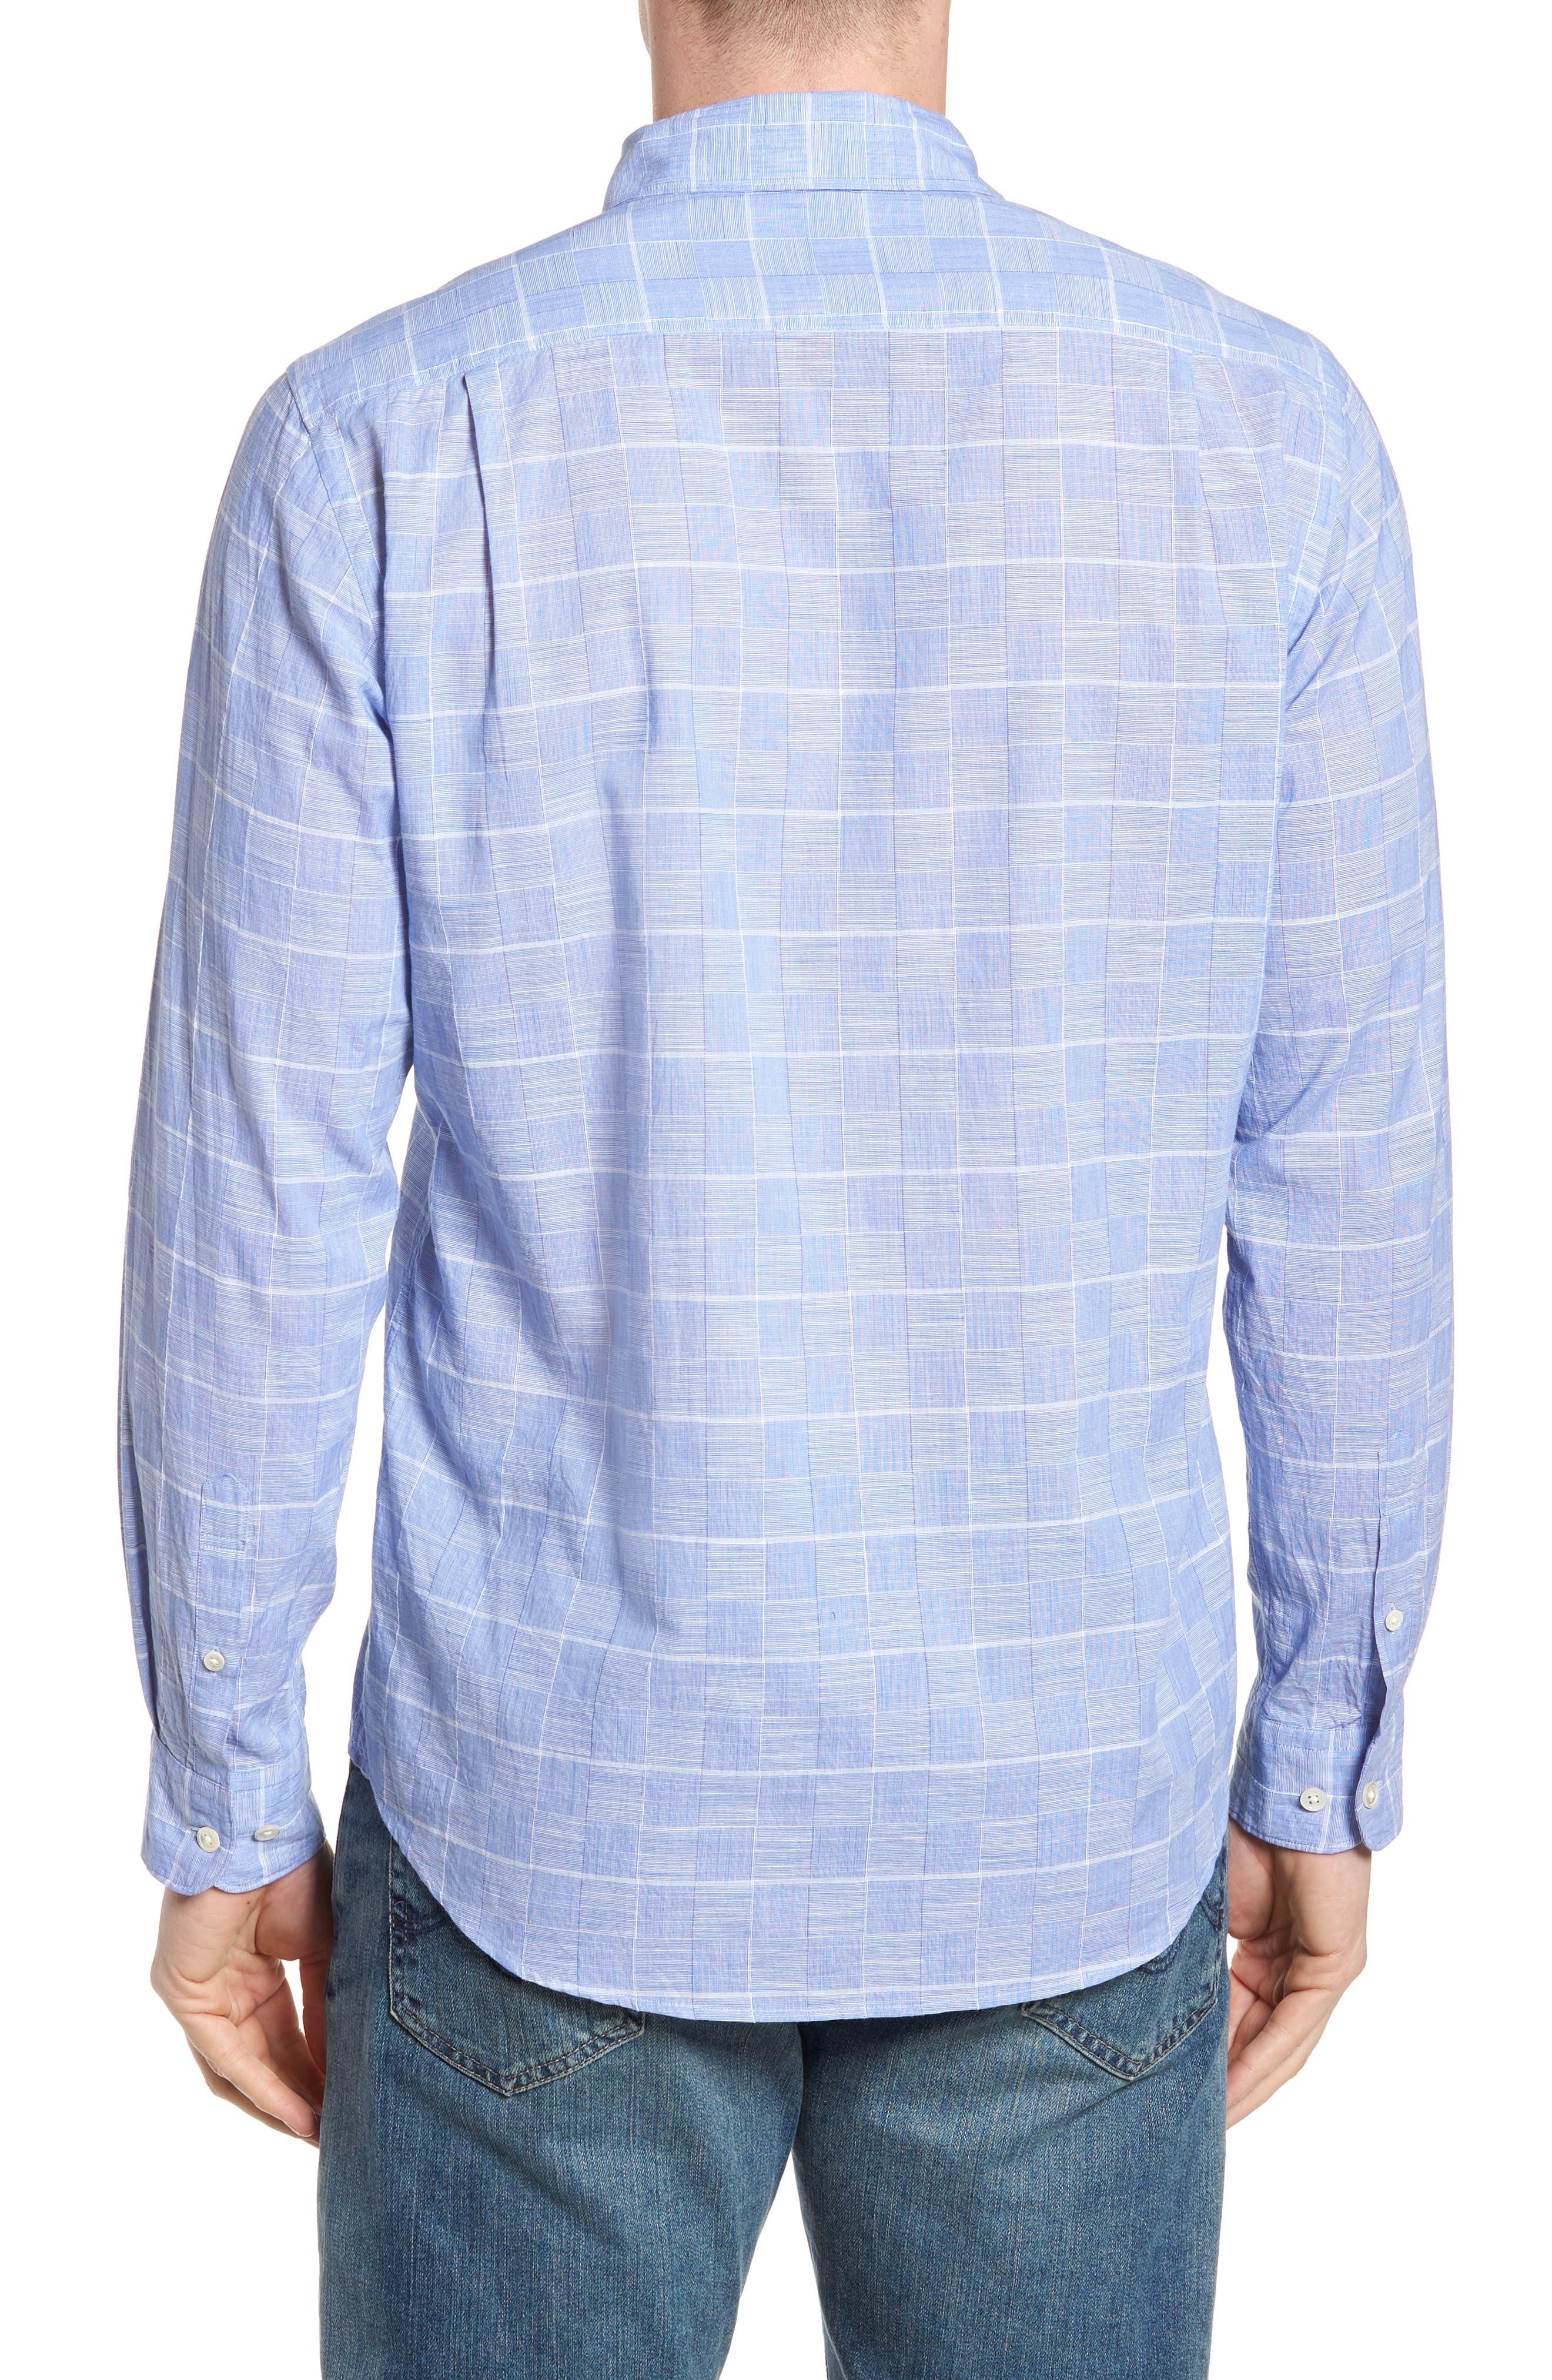 Tussock Creek Regular Fit Check Sport Shirt,                             Alternate thumbnail 3, color,                             Azure